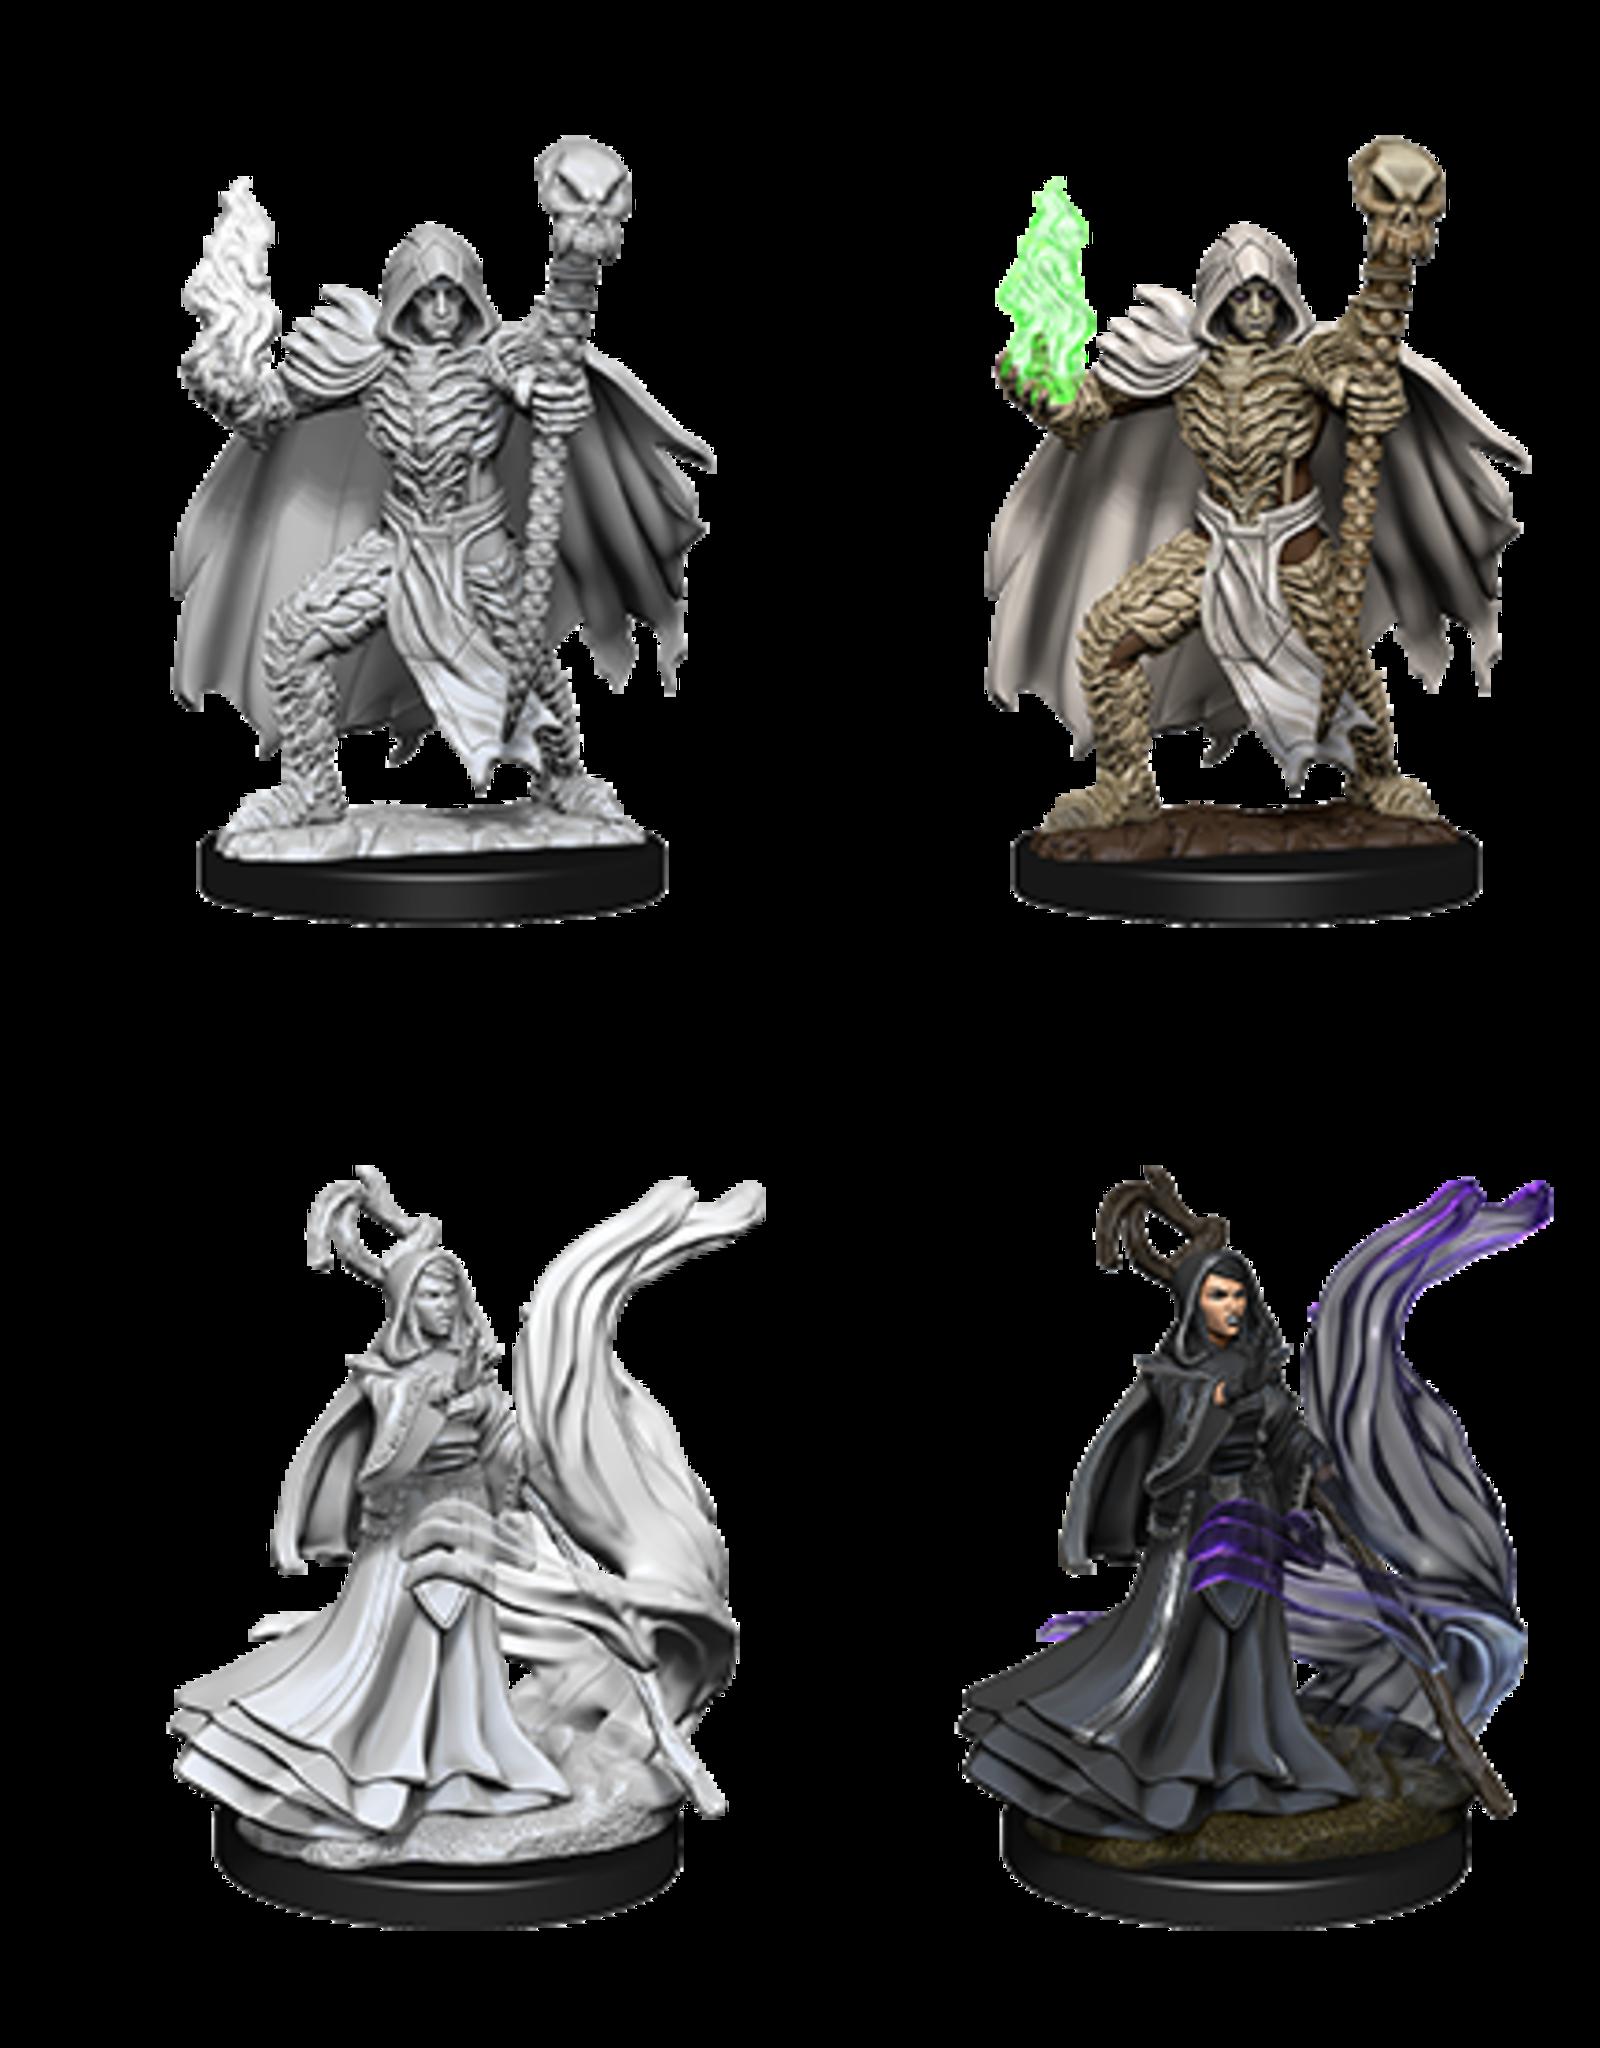 Dungeons & Dragons D&D NMU - Necromancers